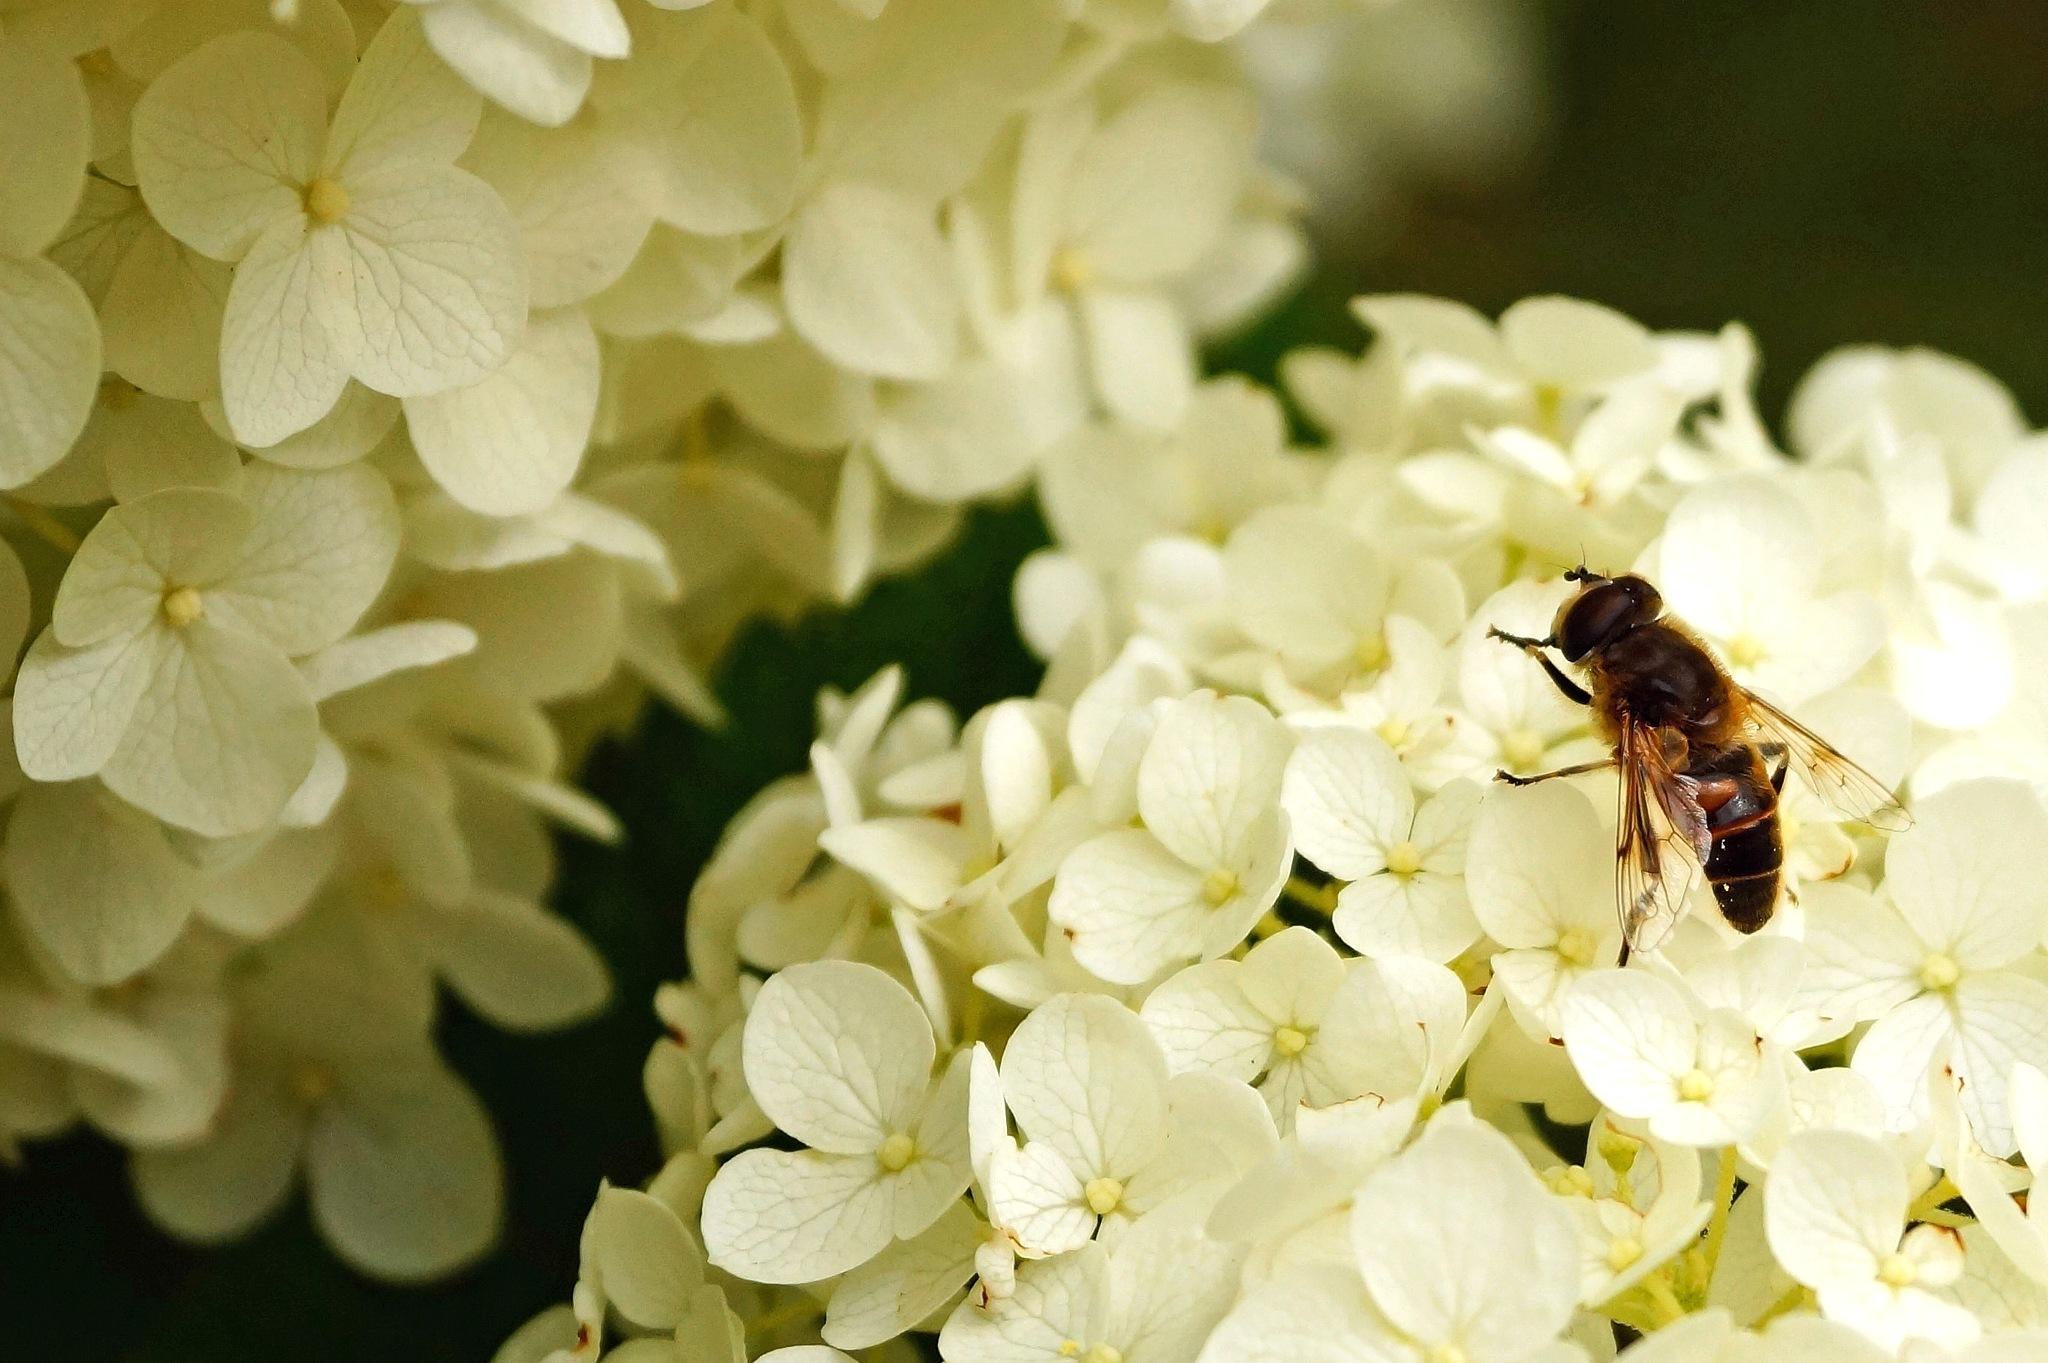 Bee on Hydrangea by Marian Baay